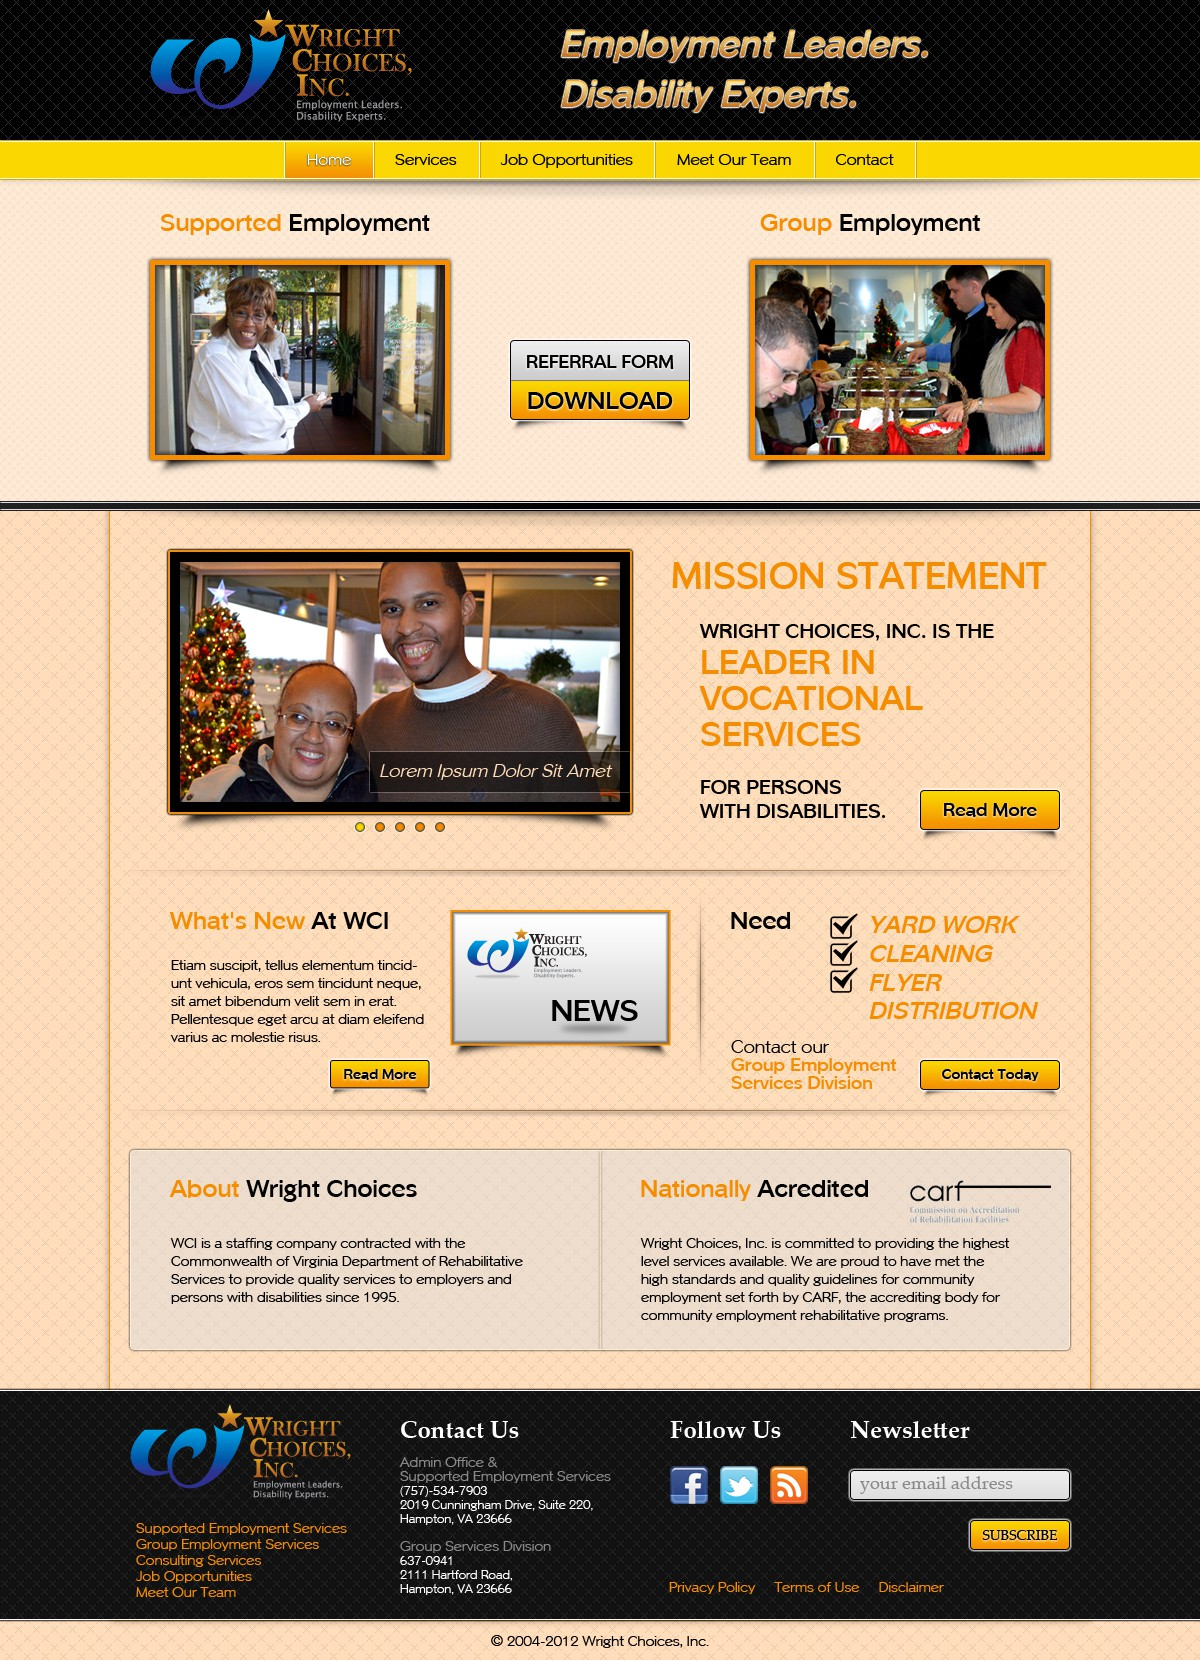 website design for Wright Choices, Inc.